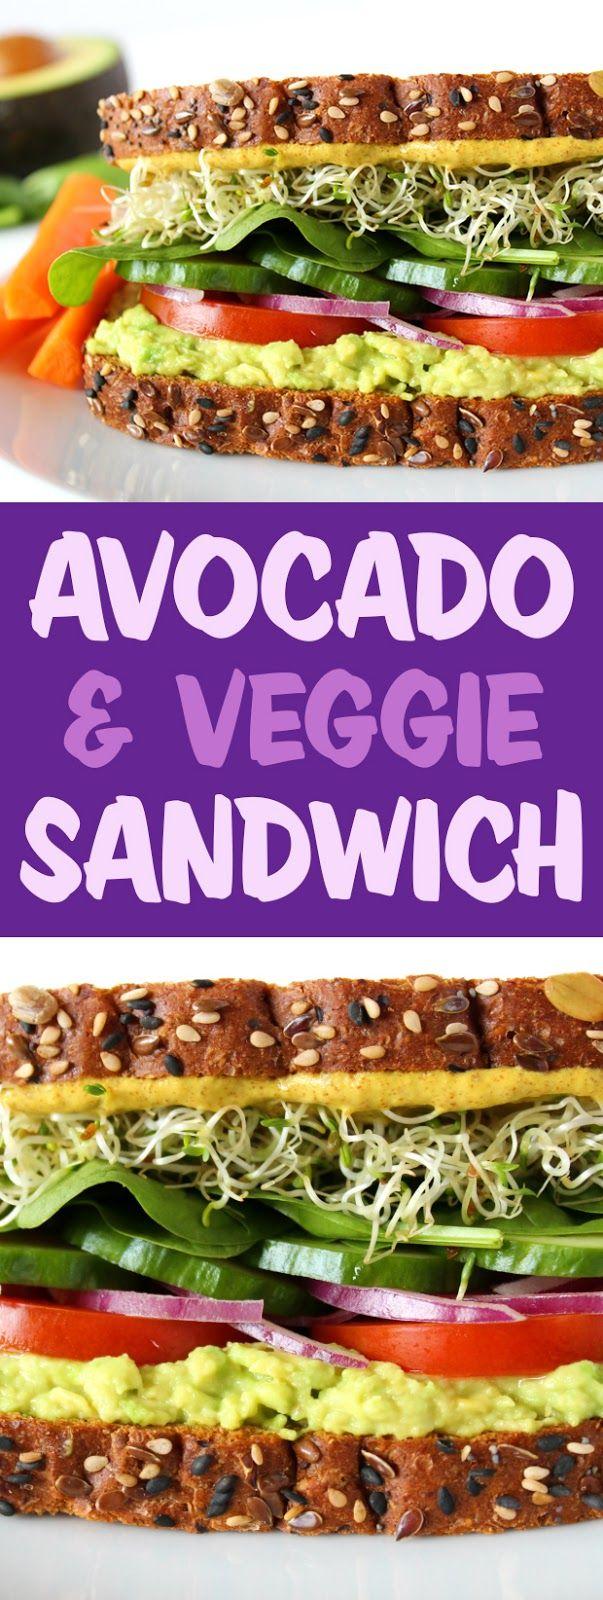 Avocado Veggie Sandwich images